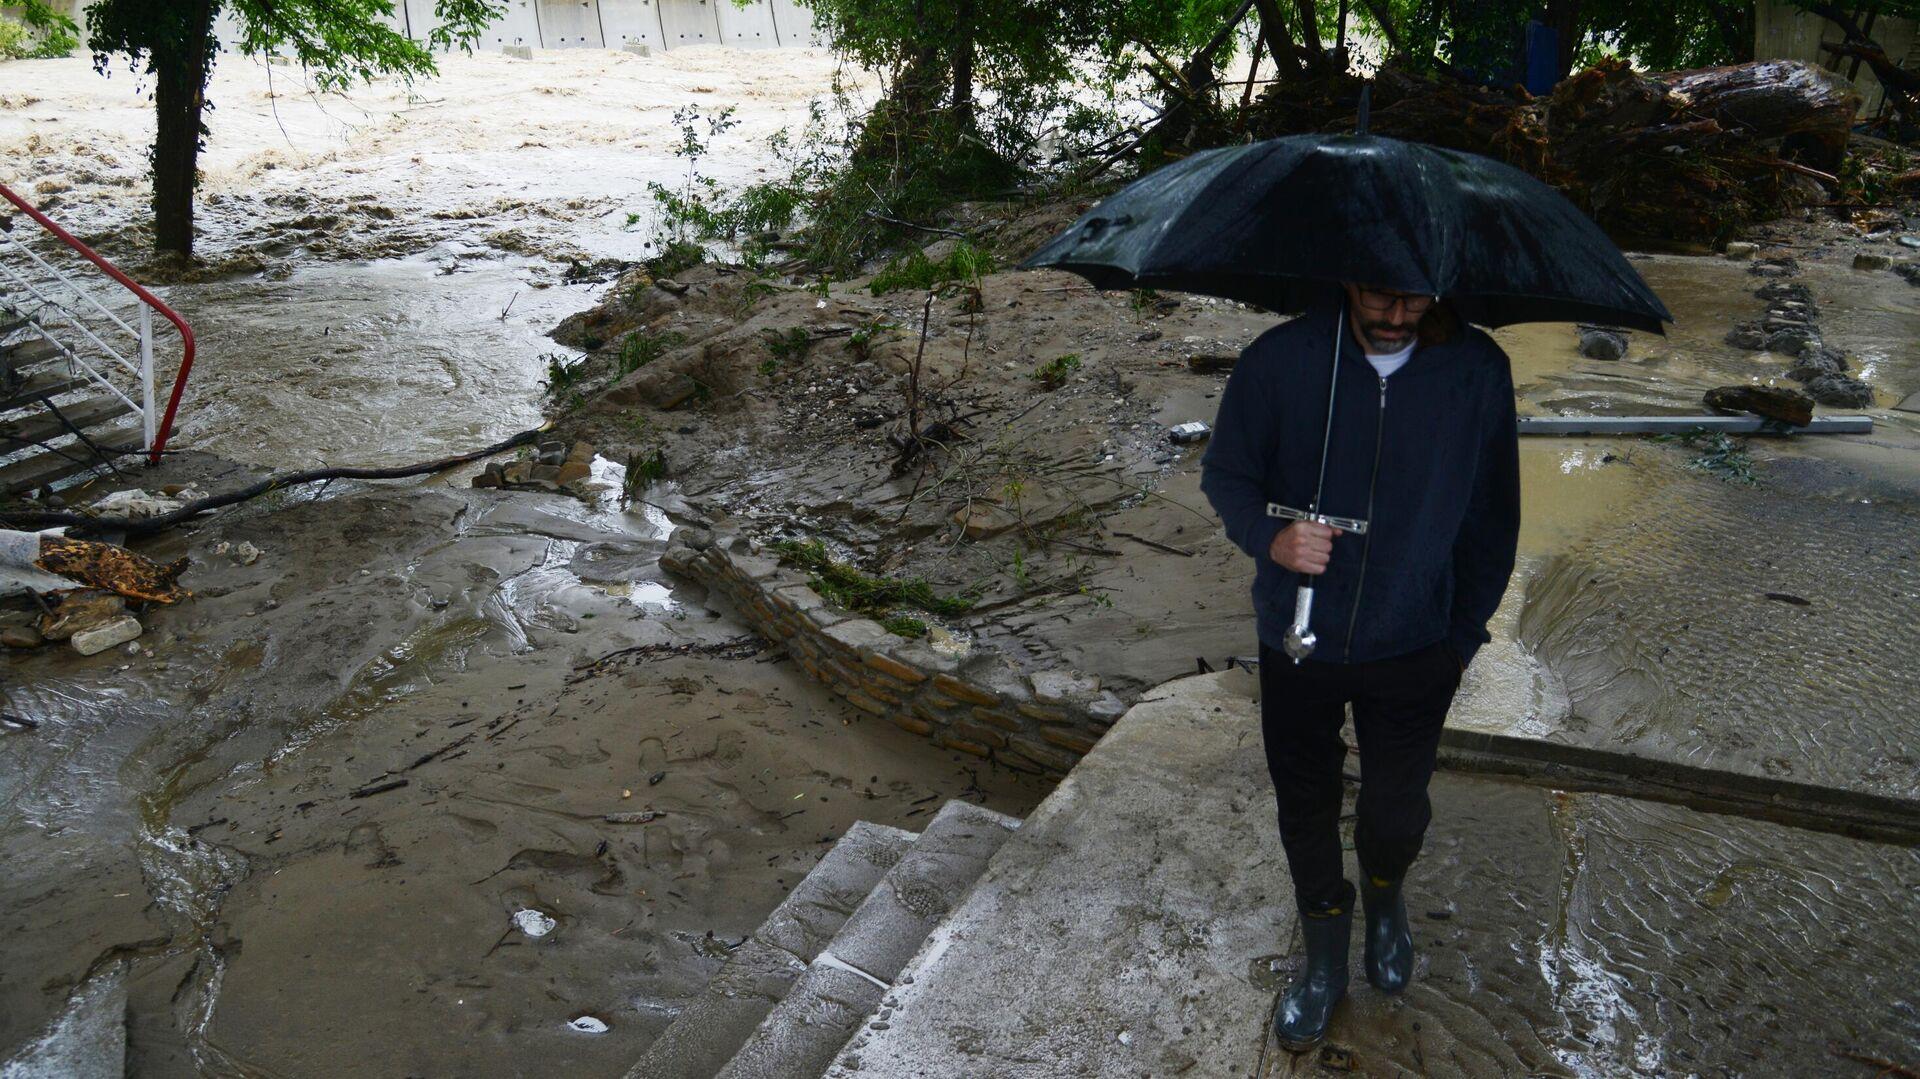 Мужчина на берегу реки Кудепста в Хостинском районе Сочи - РИА Новости, 1920, 24.07.2021